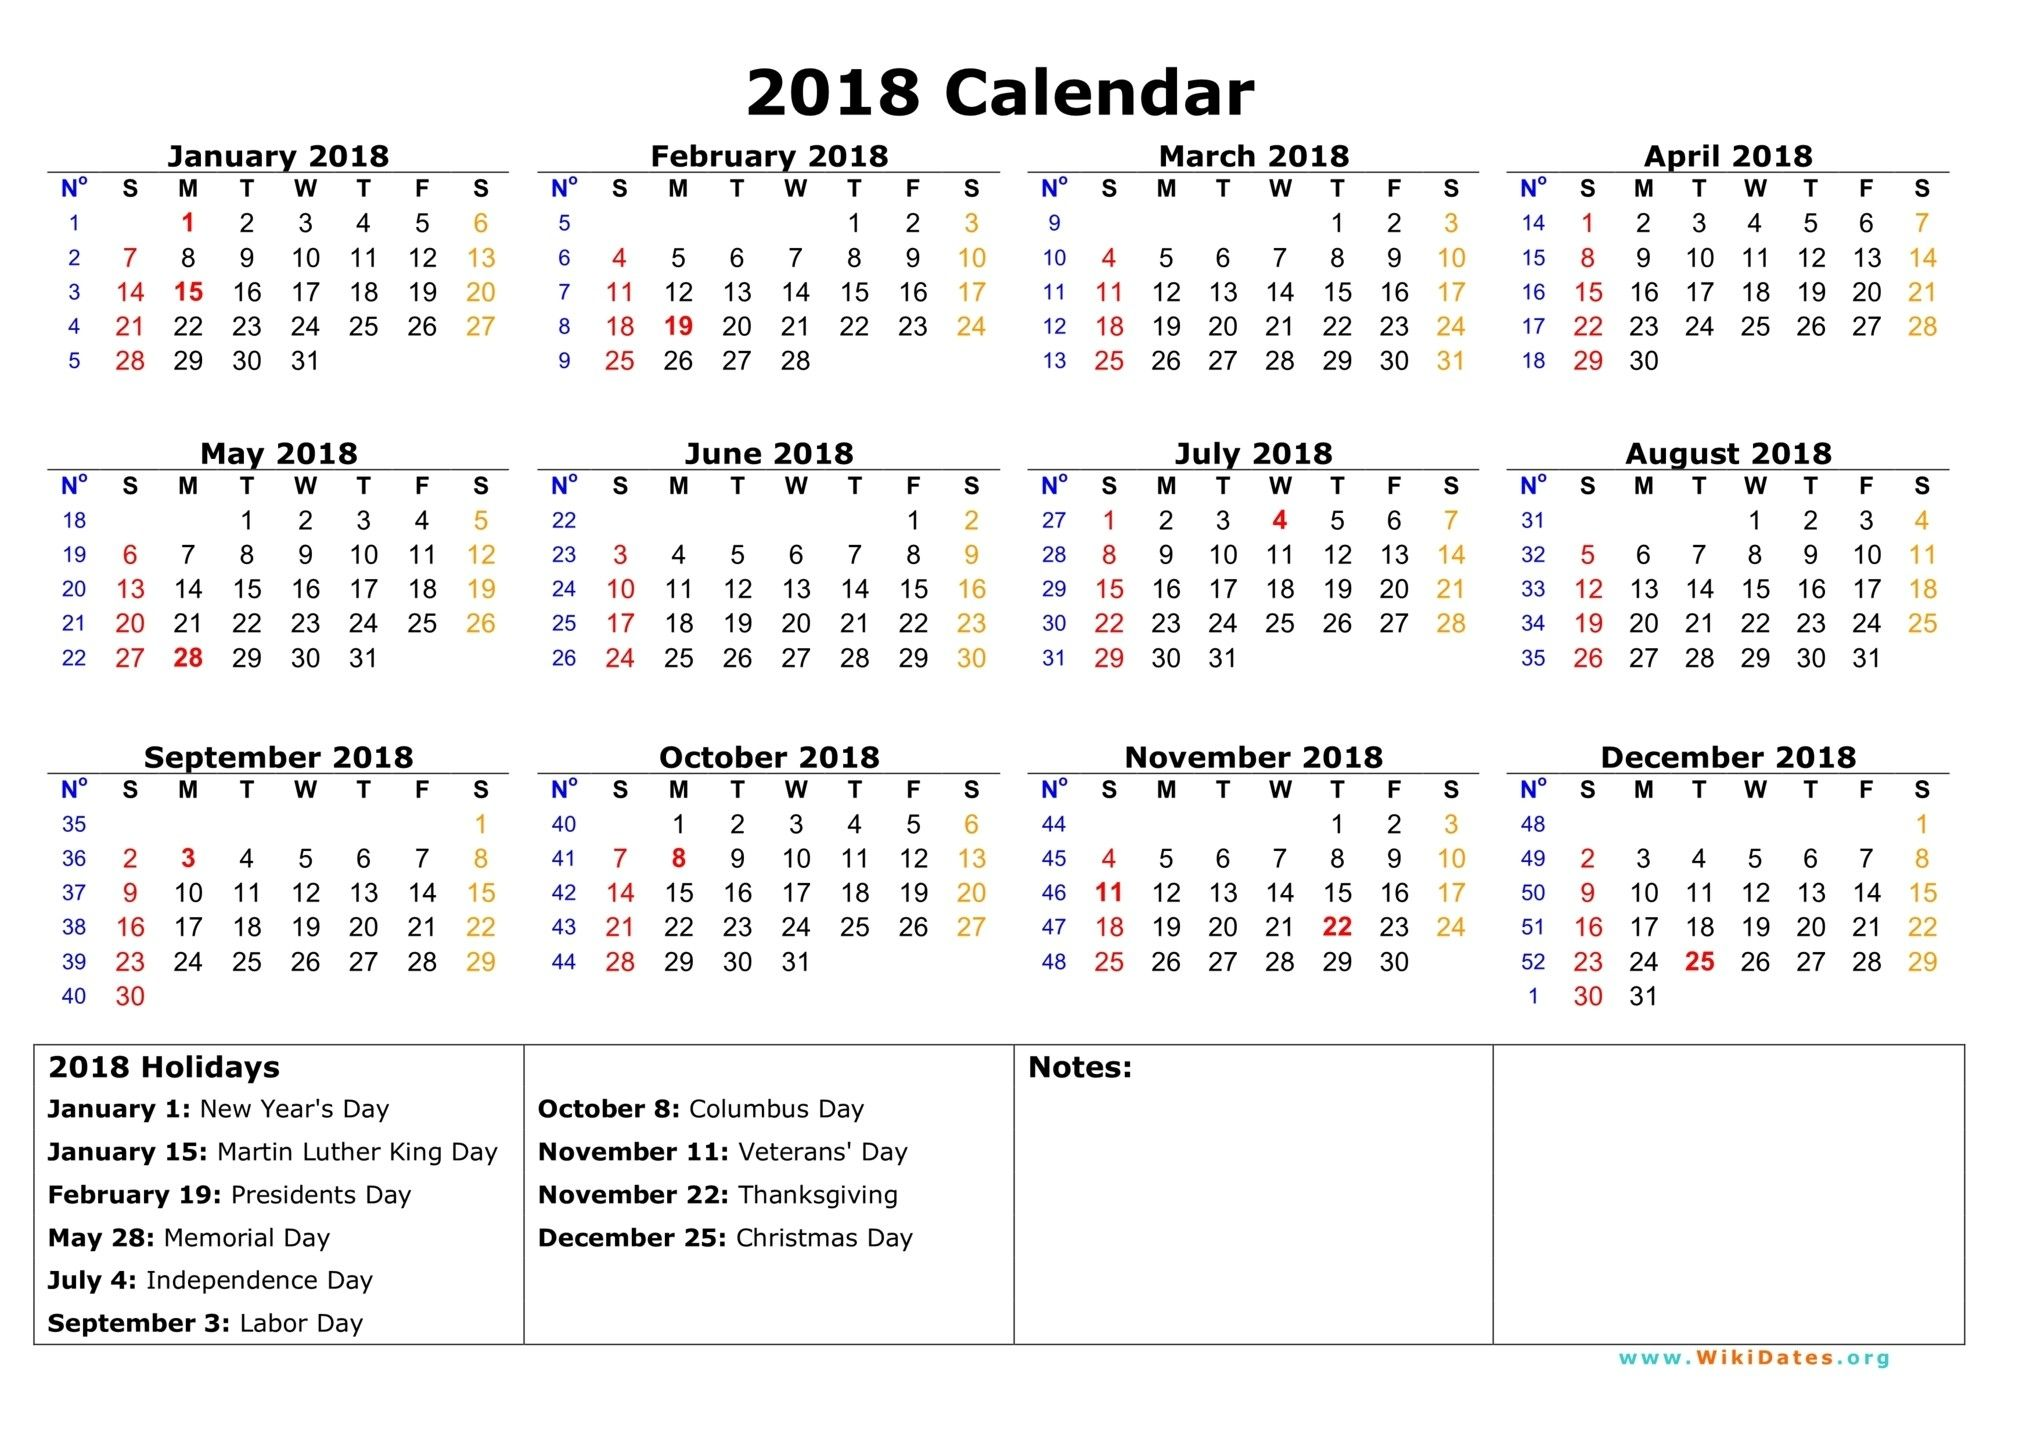 January 2018 Calendar HD 4k Wallpapers   HDWall4kCom 2037x1440